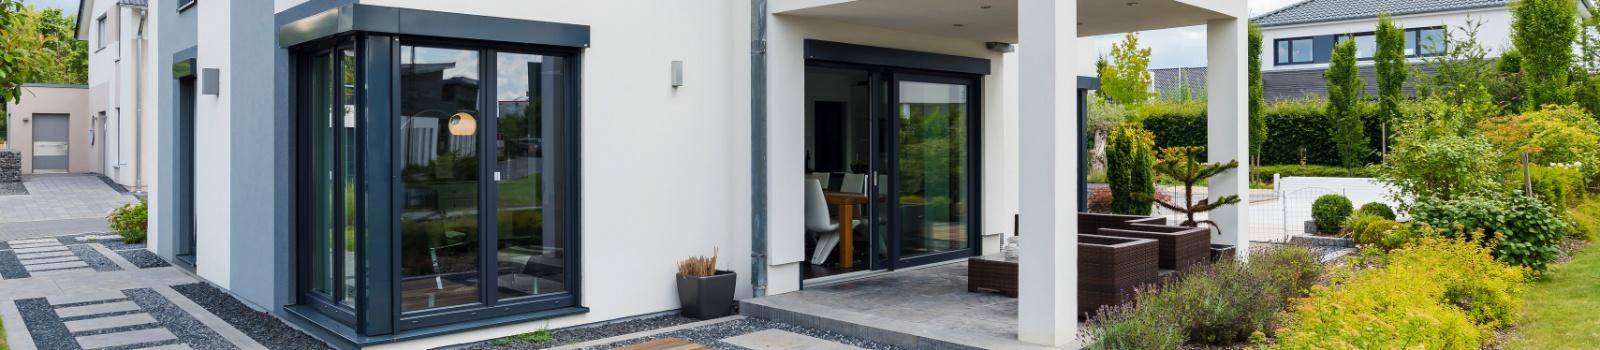 Fenêtres et portes-fenêtres en aluminium